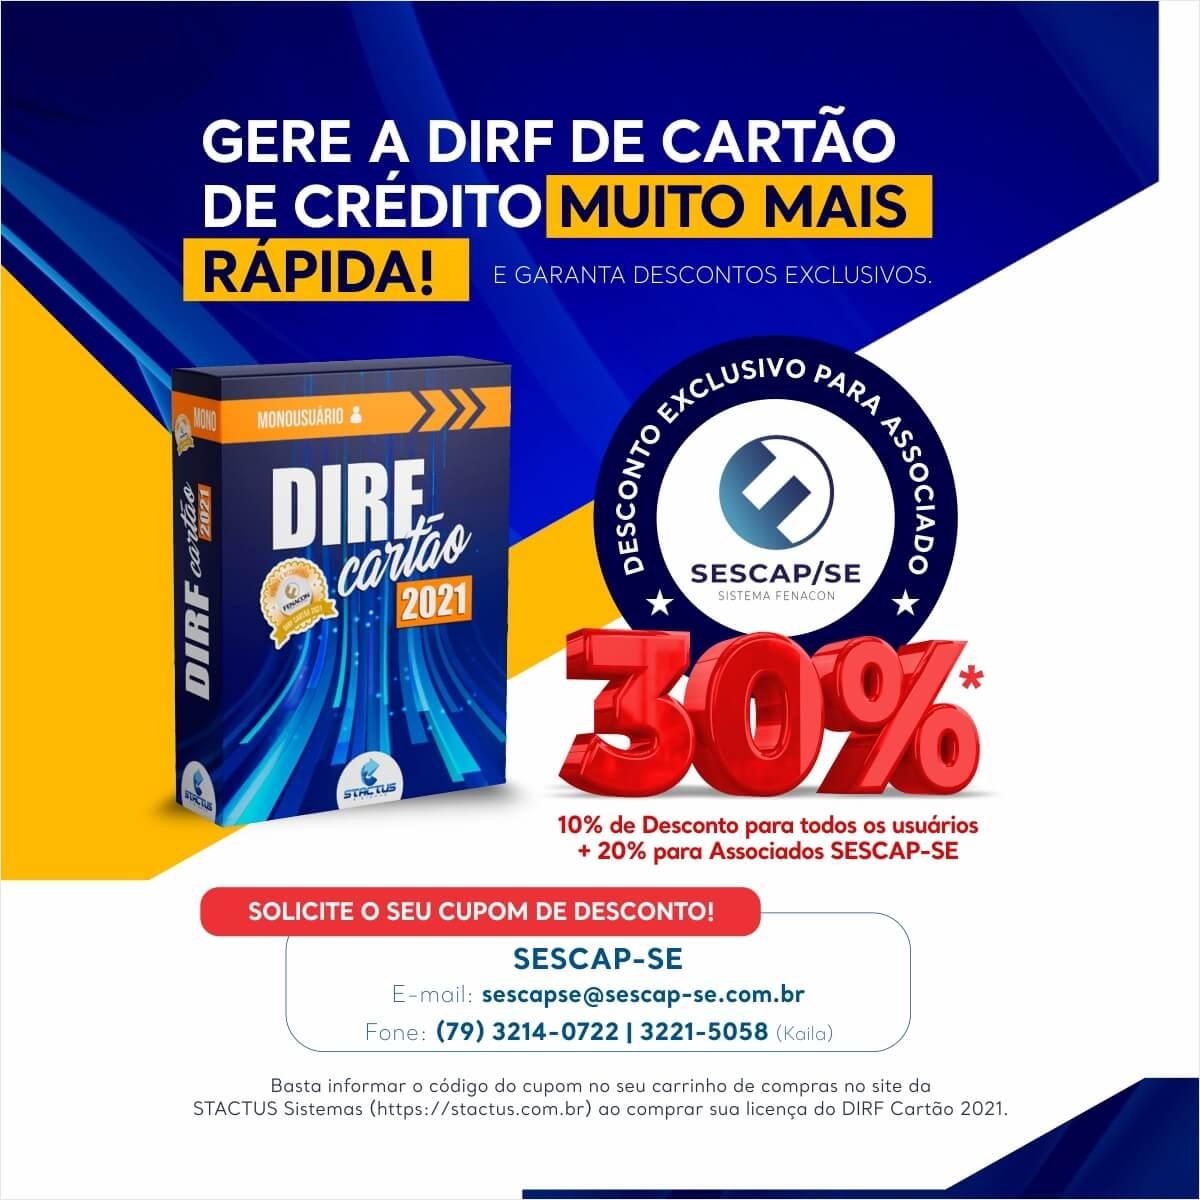 PARCERIA SESCAP/SE E STACTUS SISTEMAS: DIRF 2021